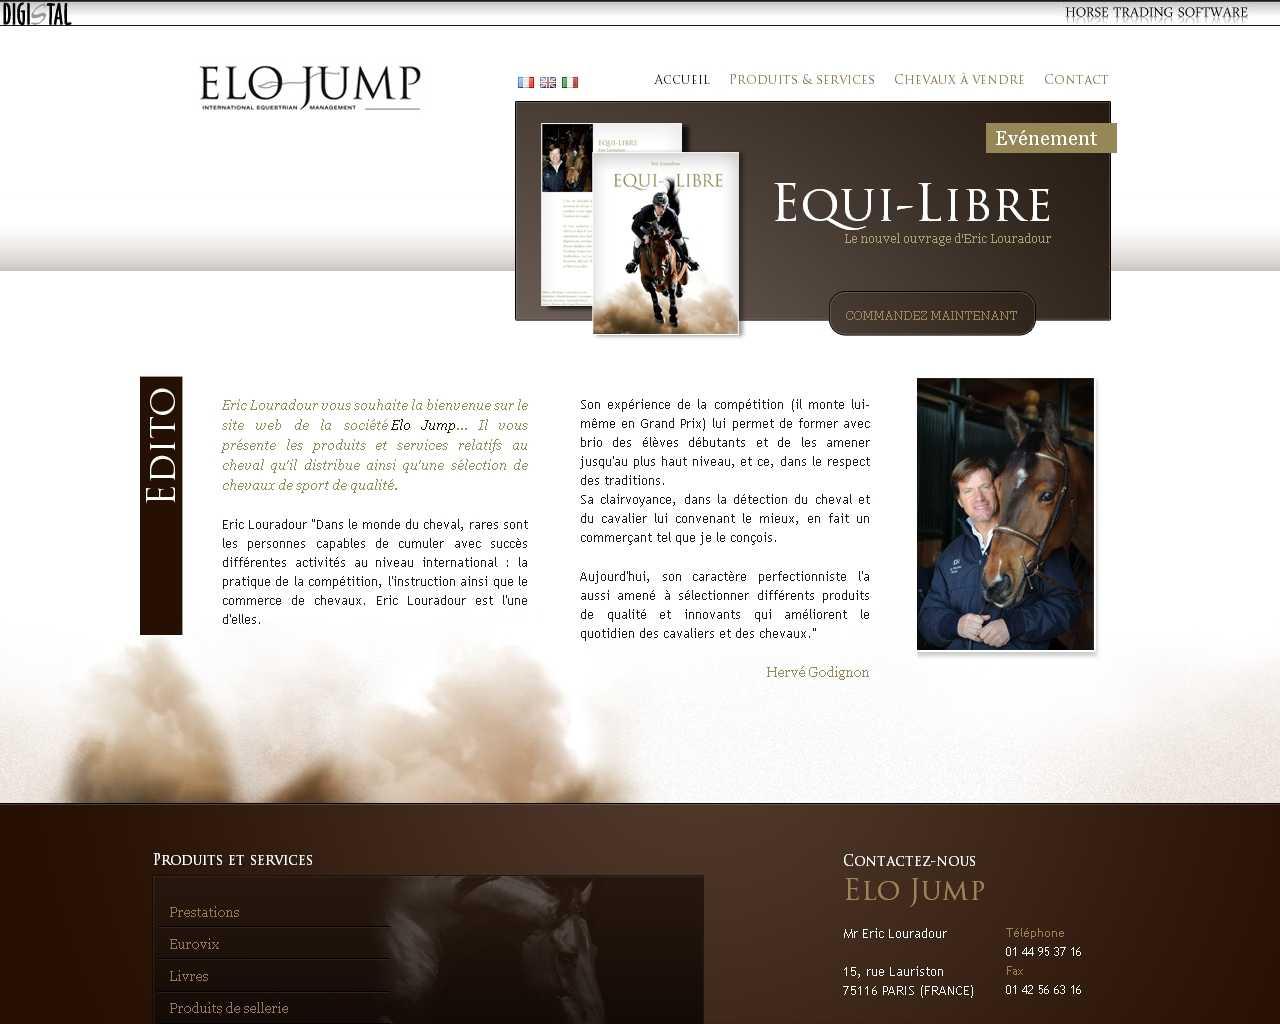 Visuel du site Elo Jump